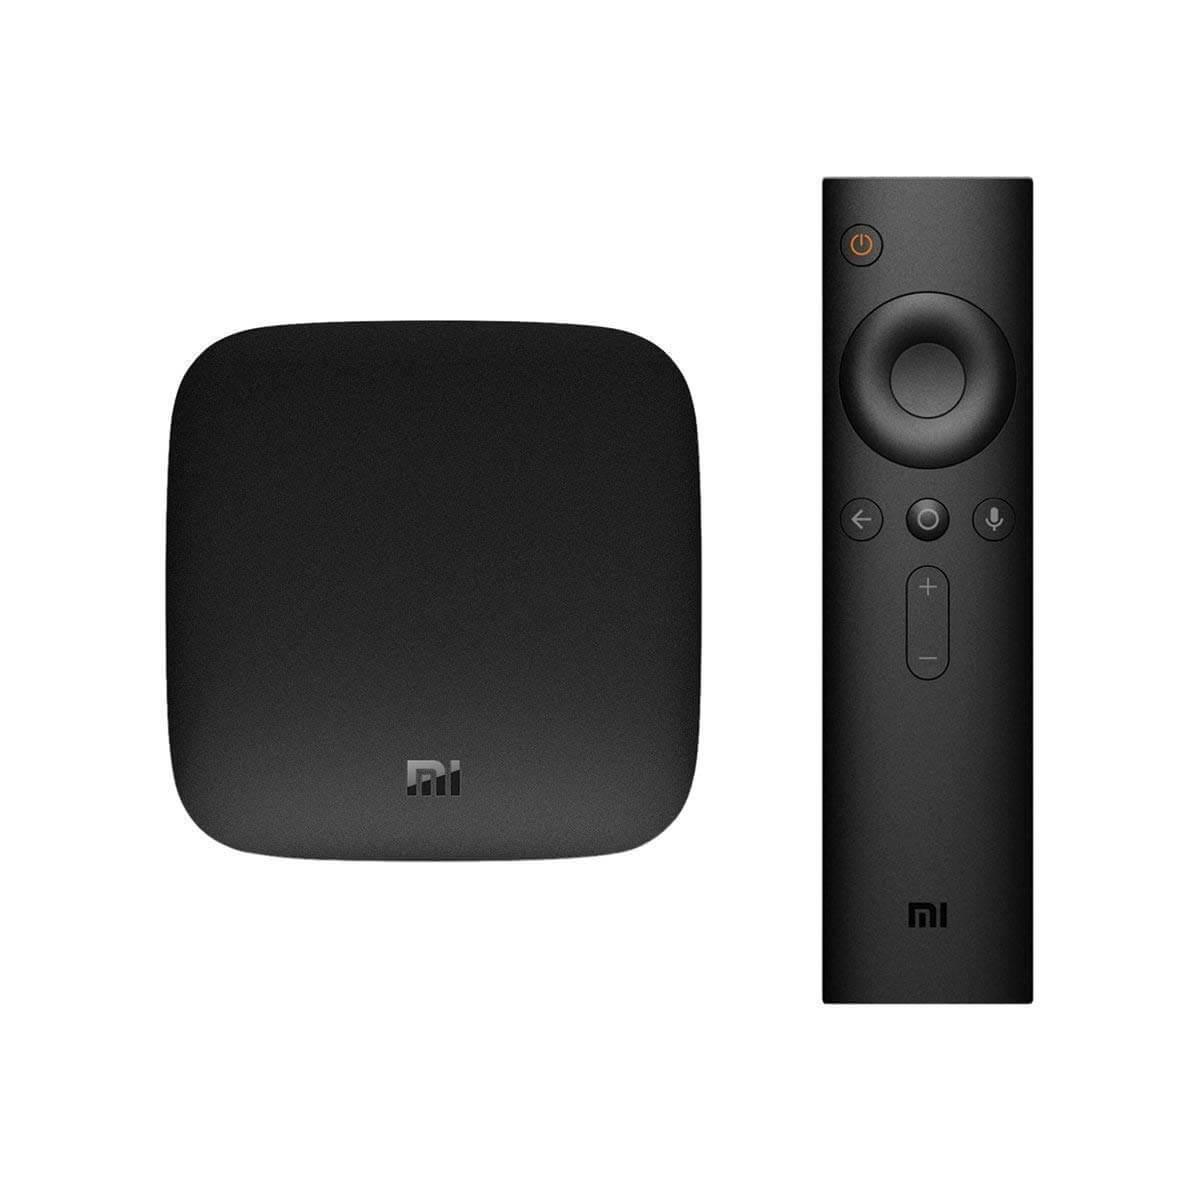 Xiaomi Mi Box - 4K Ultra HDR TV Streaming Media Player